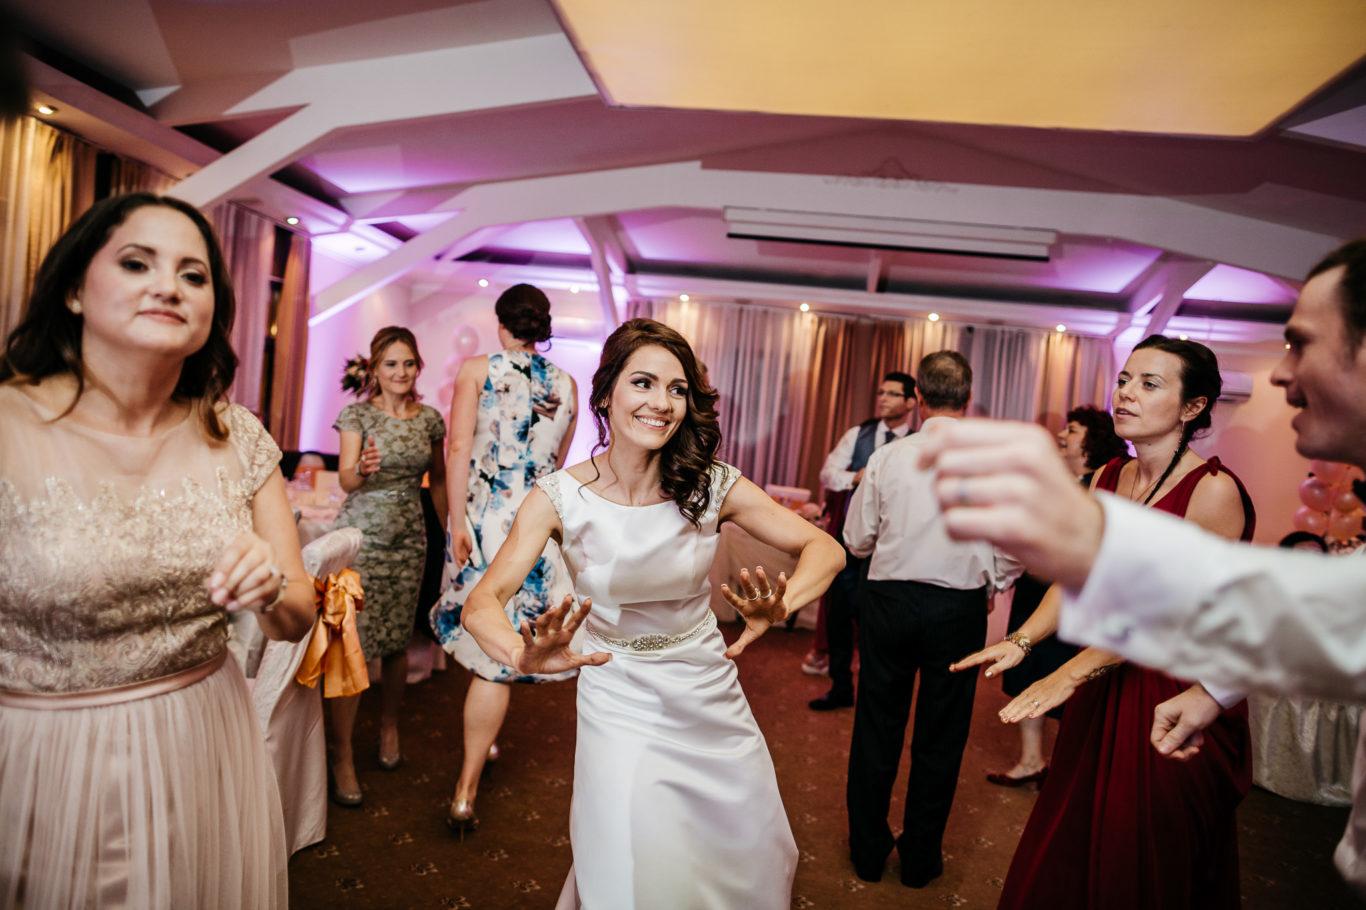 0695-fotografie-nunta-bucuresti-dana-radu-fotograf-ciprian-dumitrescu-dc1_4289